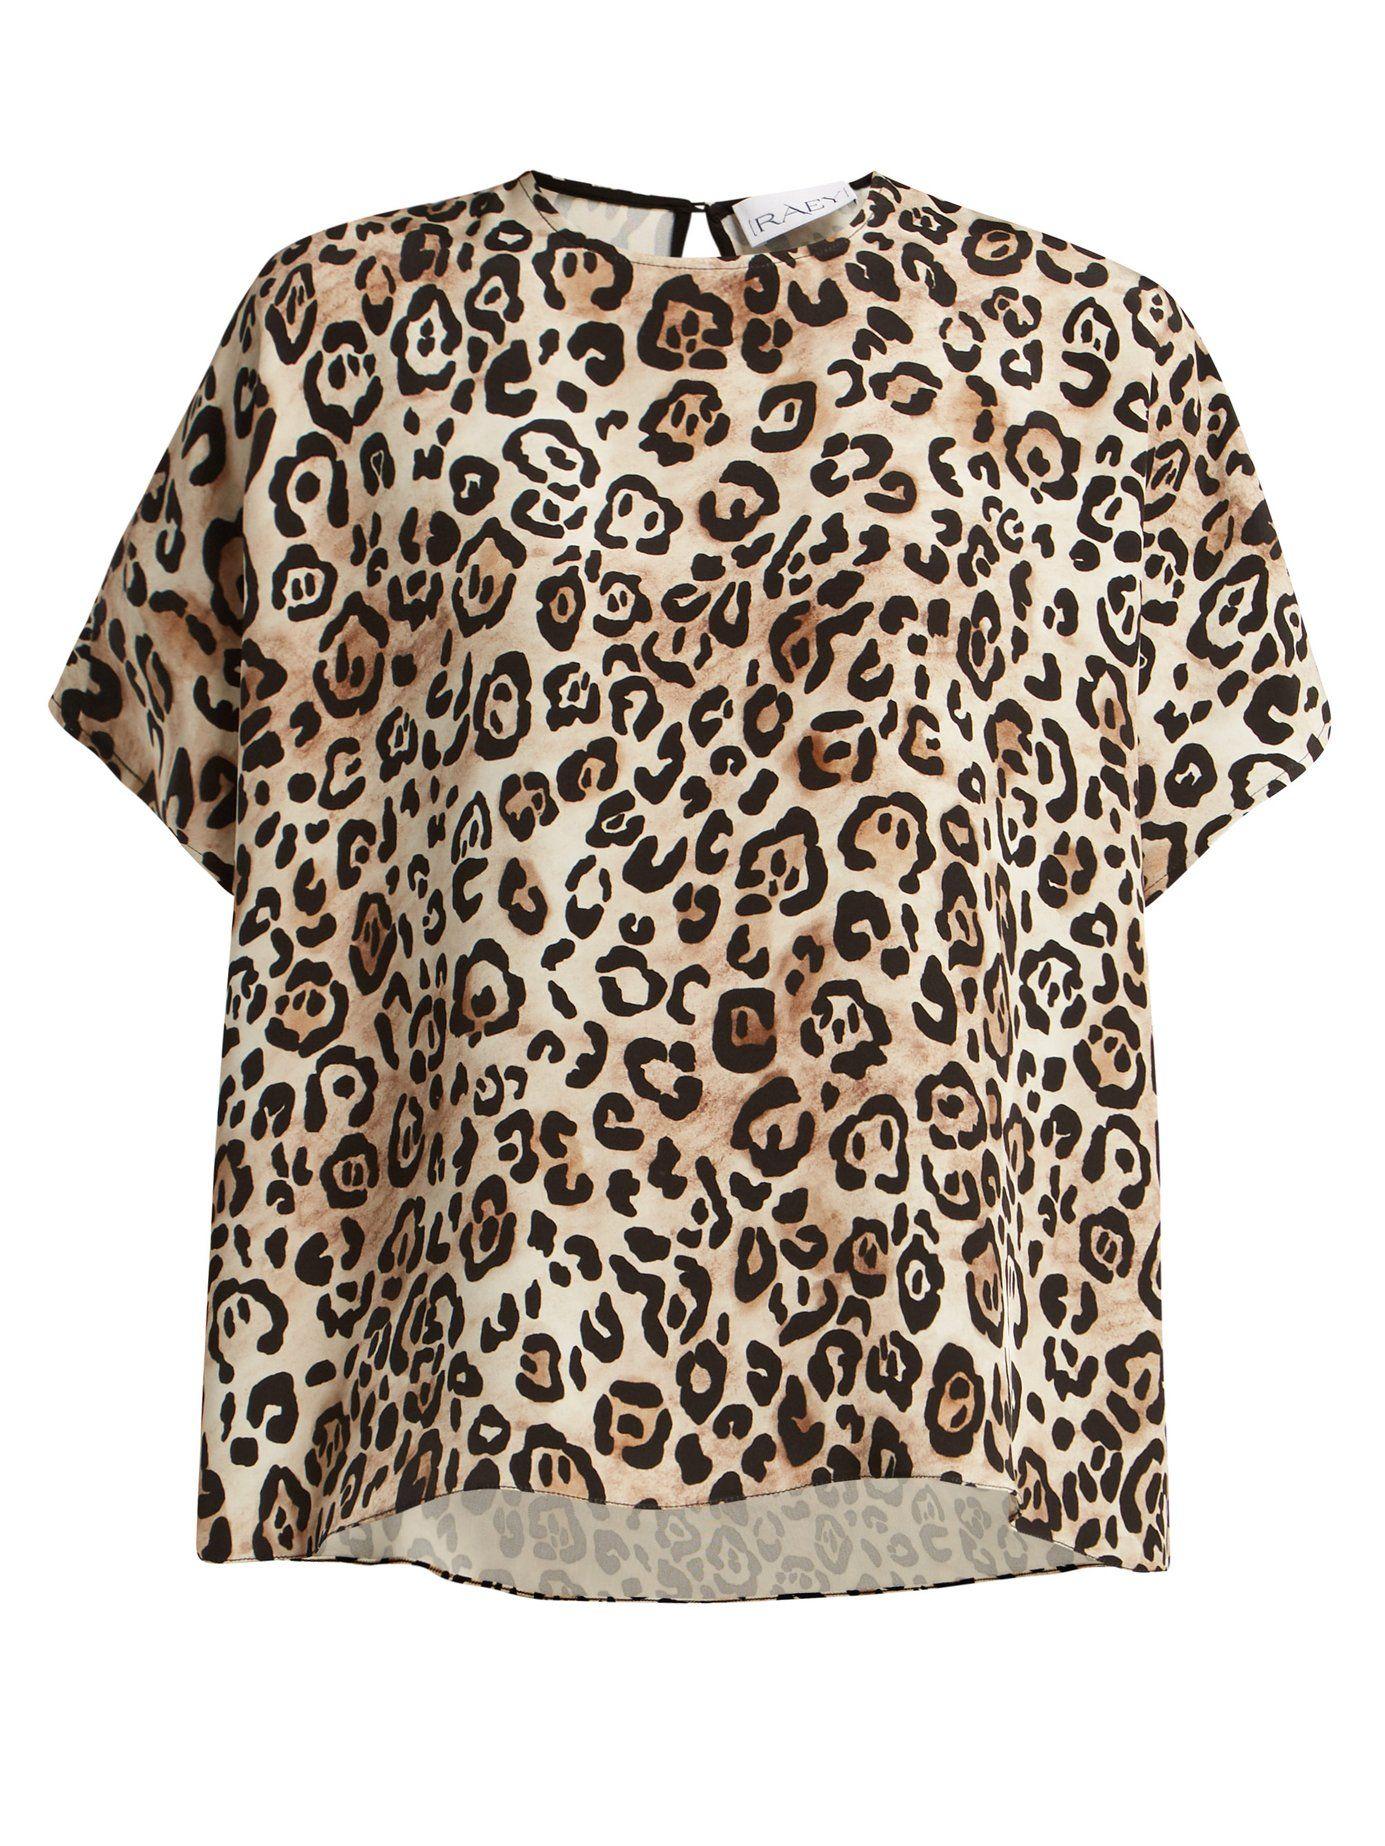 167fb1c66dc14b Square leopard-print silk top